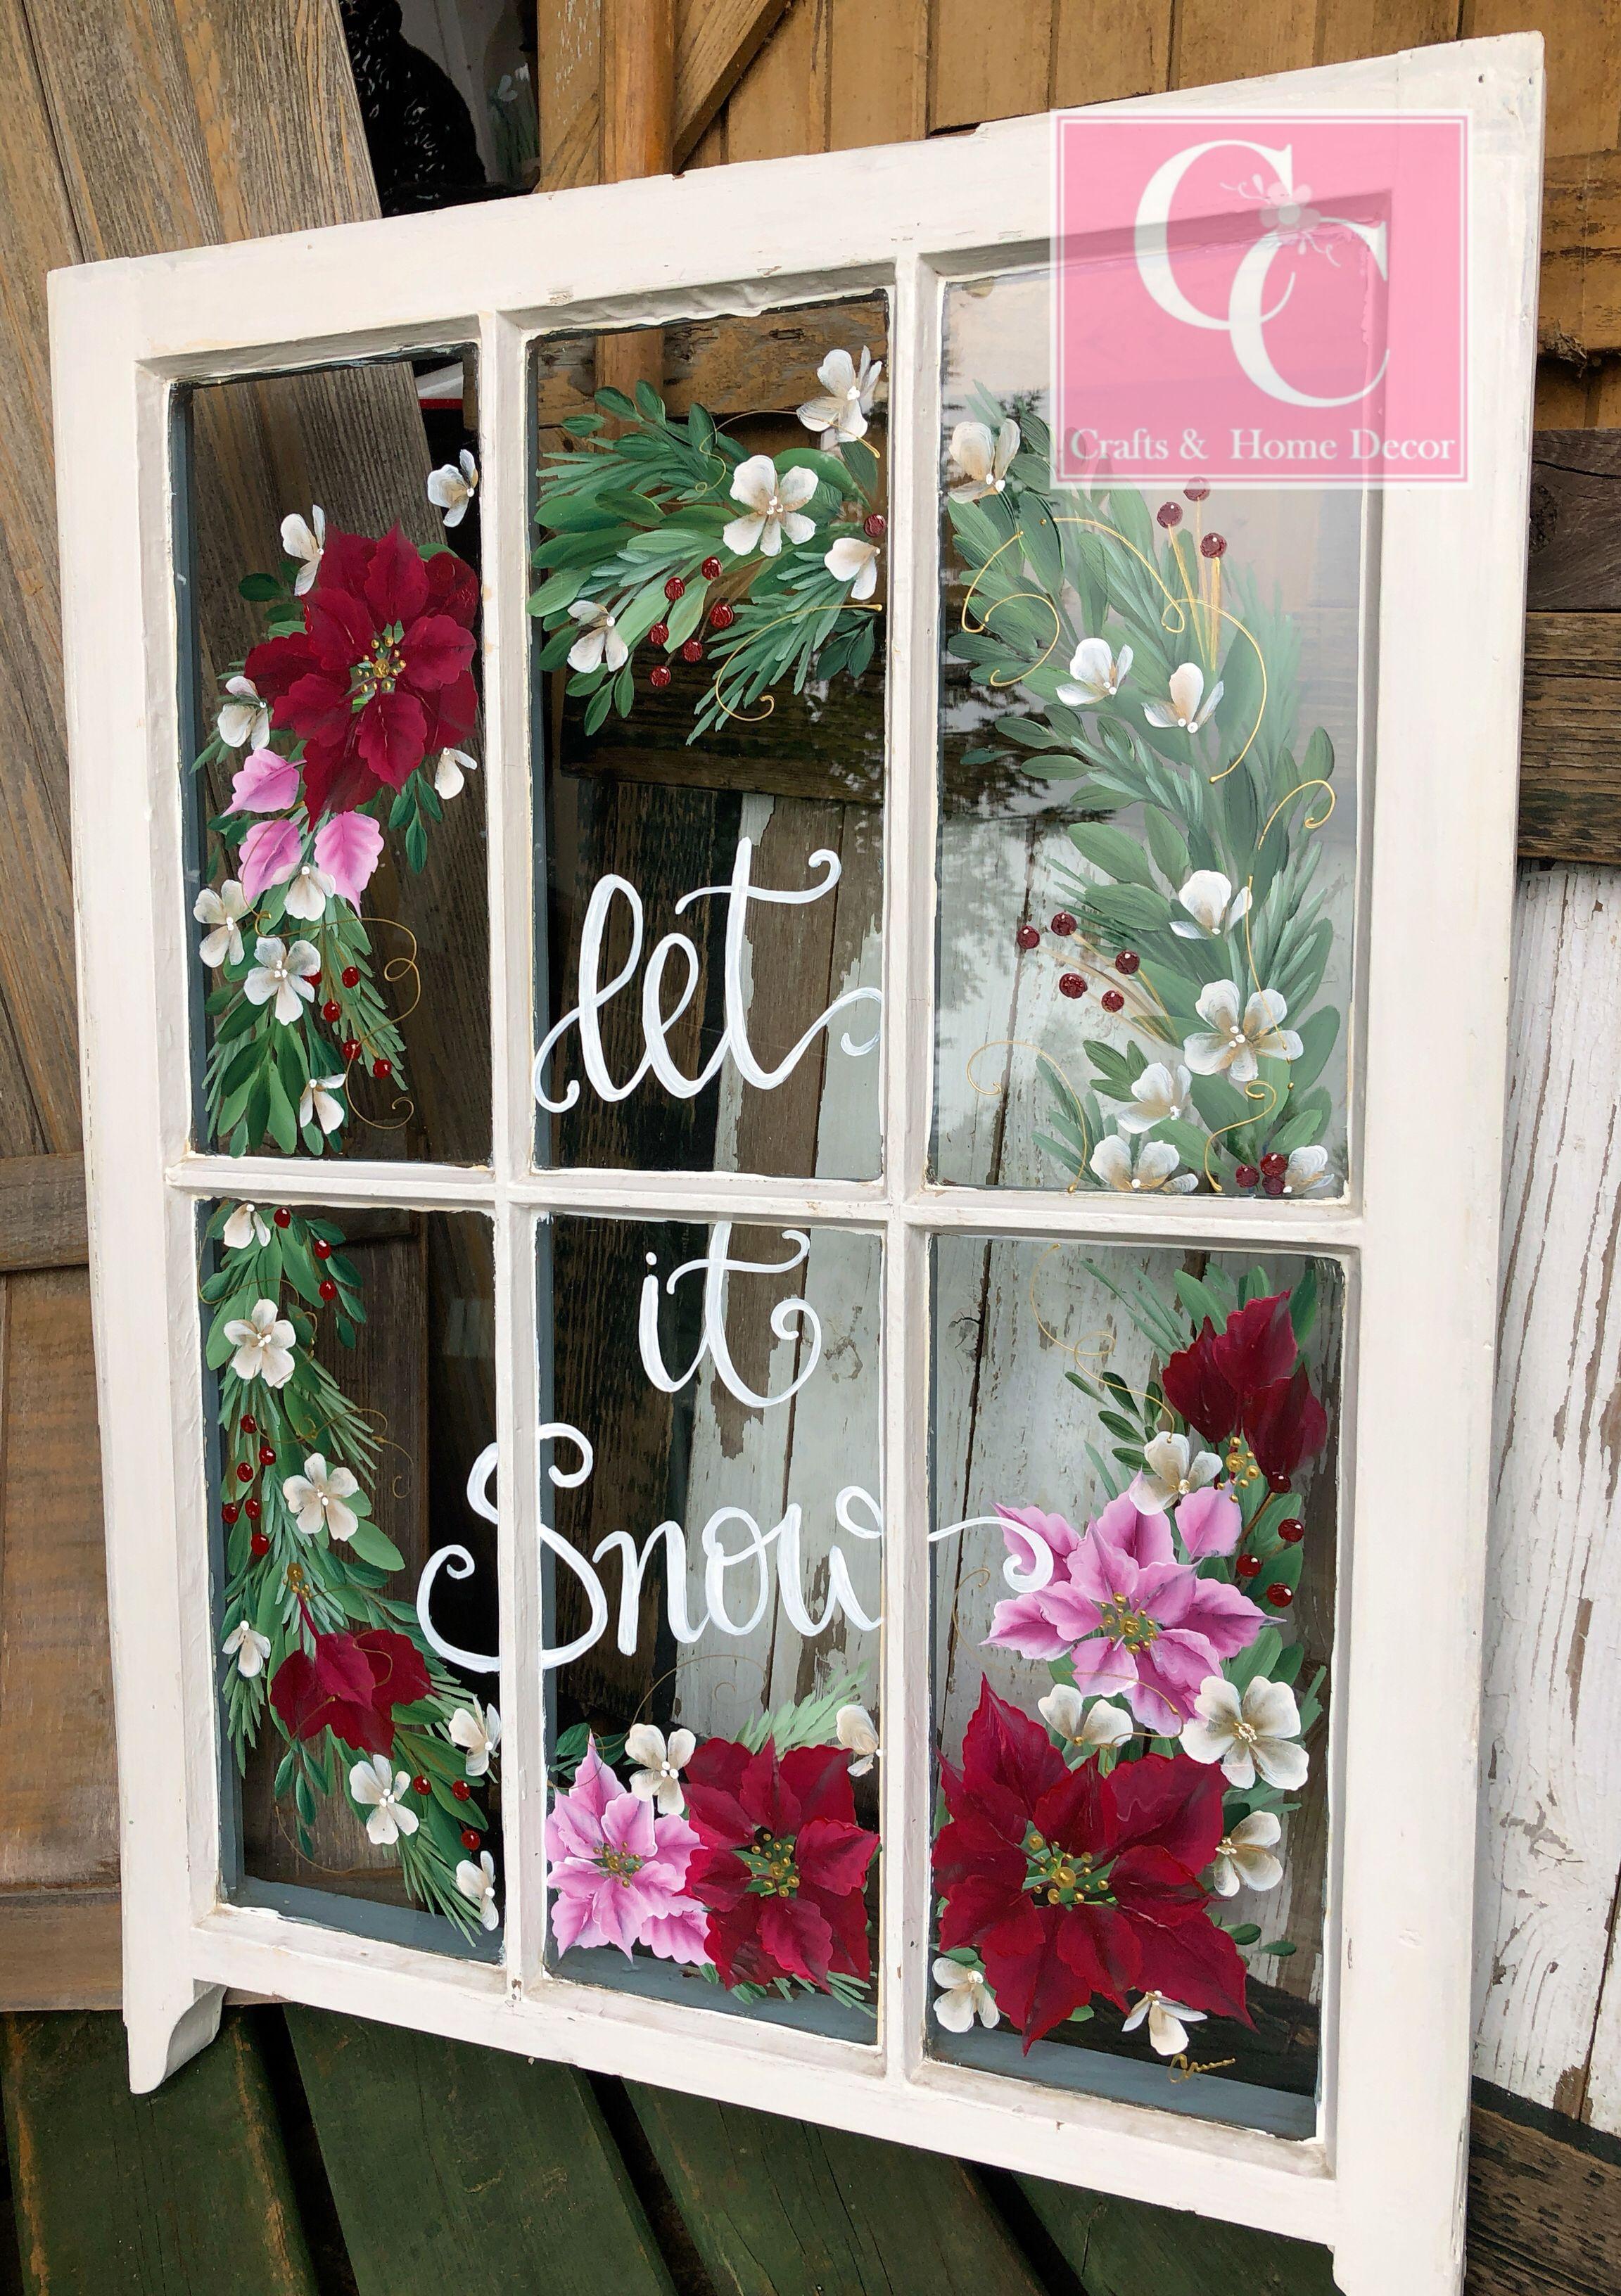 Hand Painted Vintage Christmas Wreath Window Christmas Paintings Crafts Hand Painted Windows